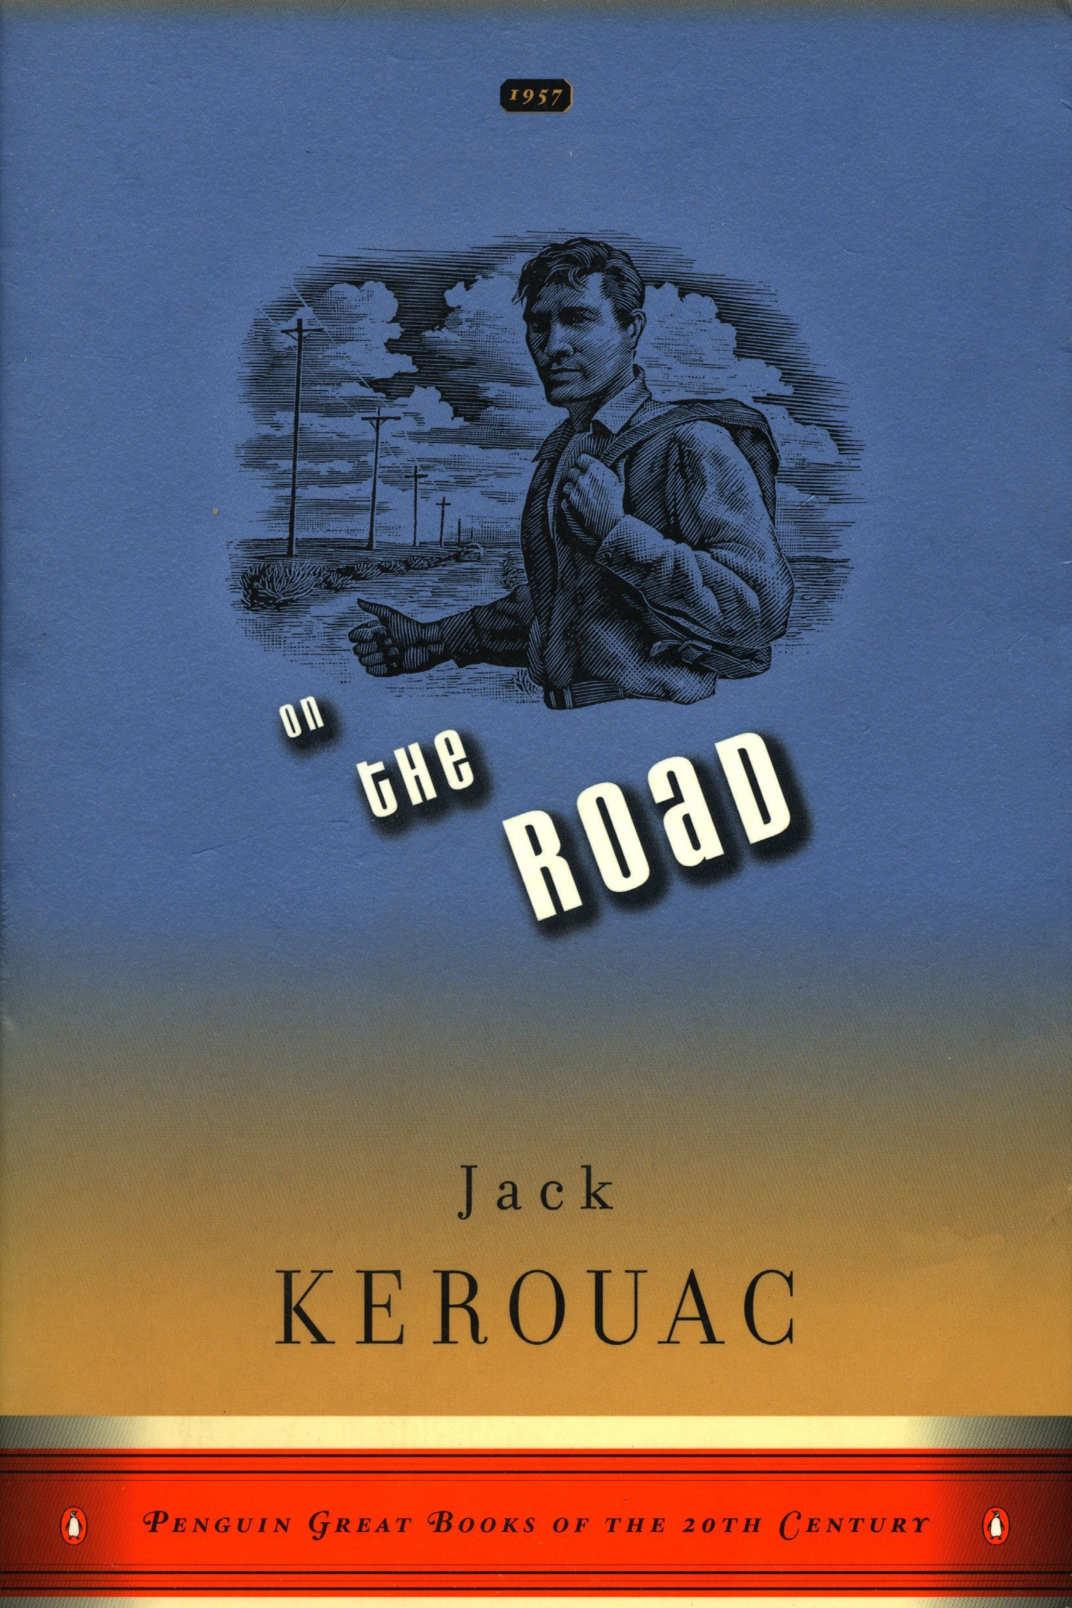 <em>On the Road</em>, by Jack Kerouac